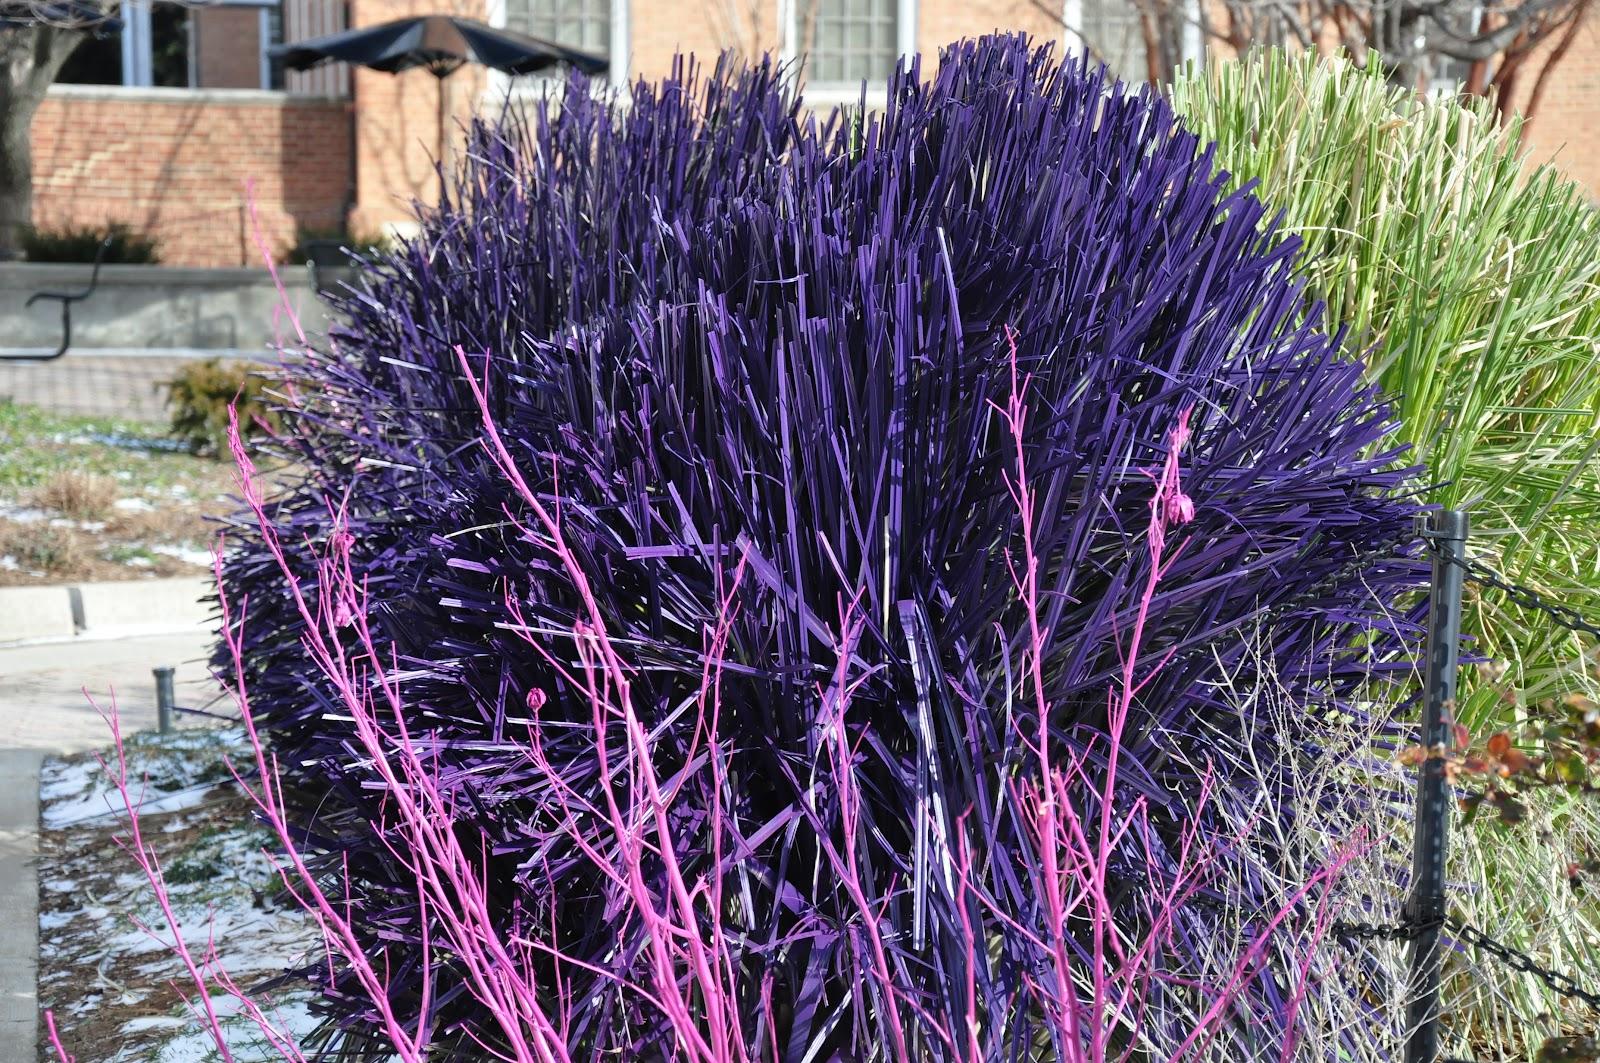 Umd arboretum and botanical garden february 2012 for Purple grass